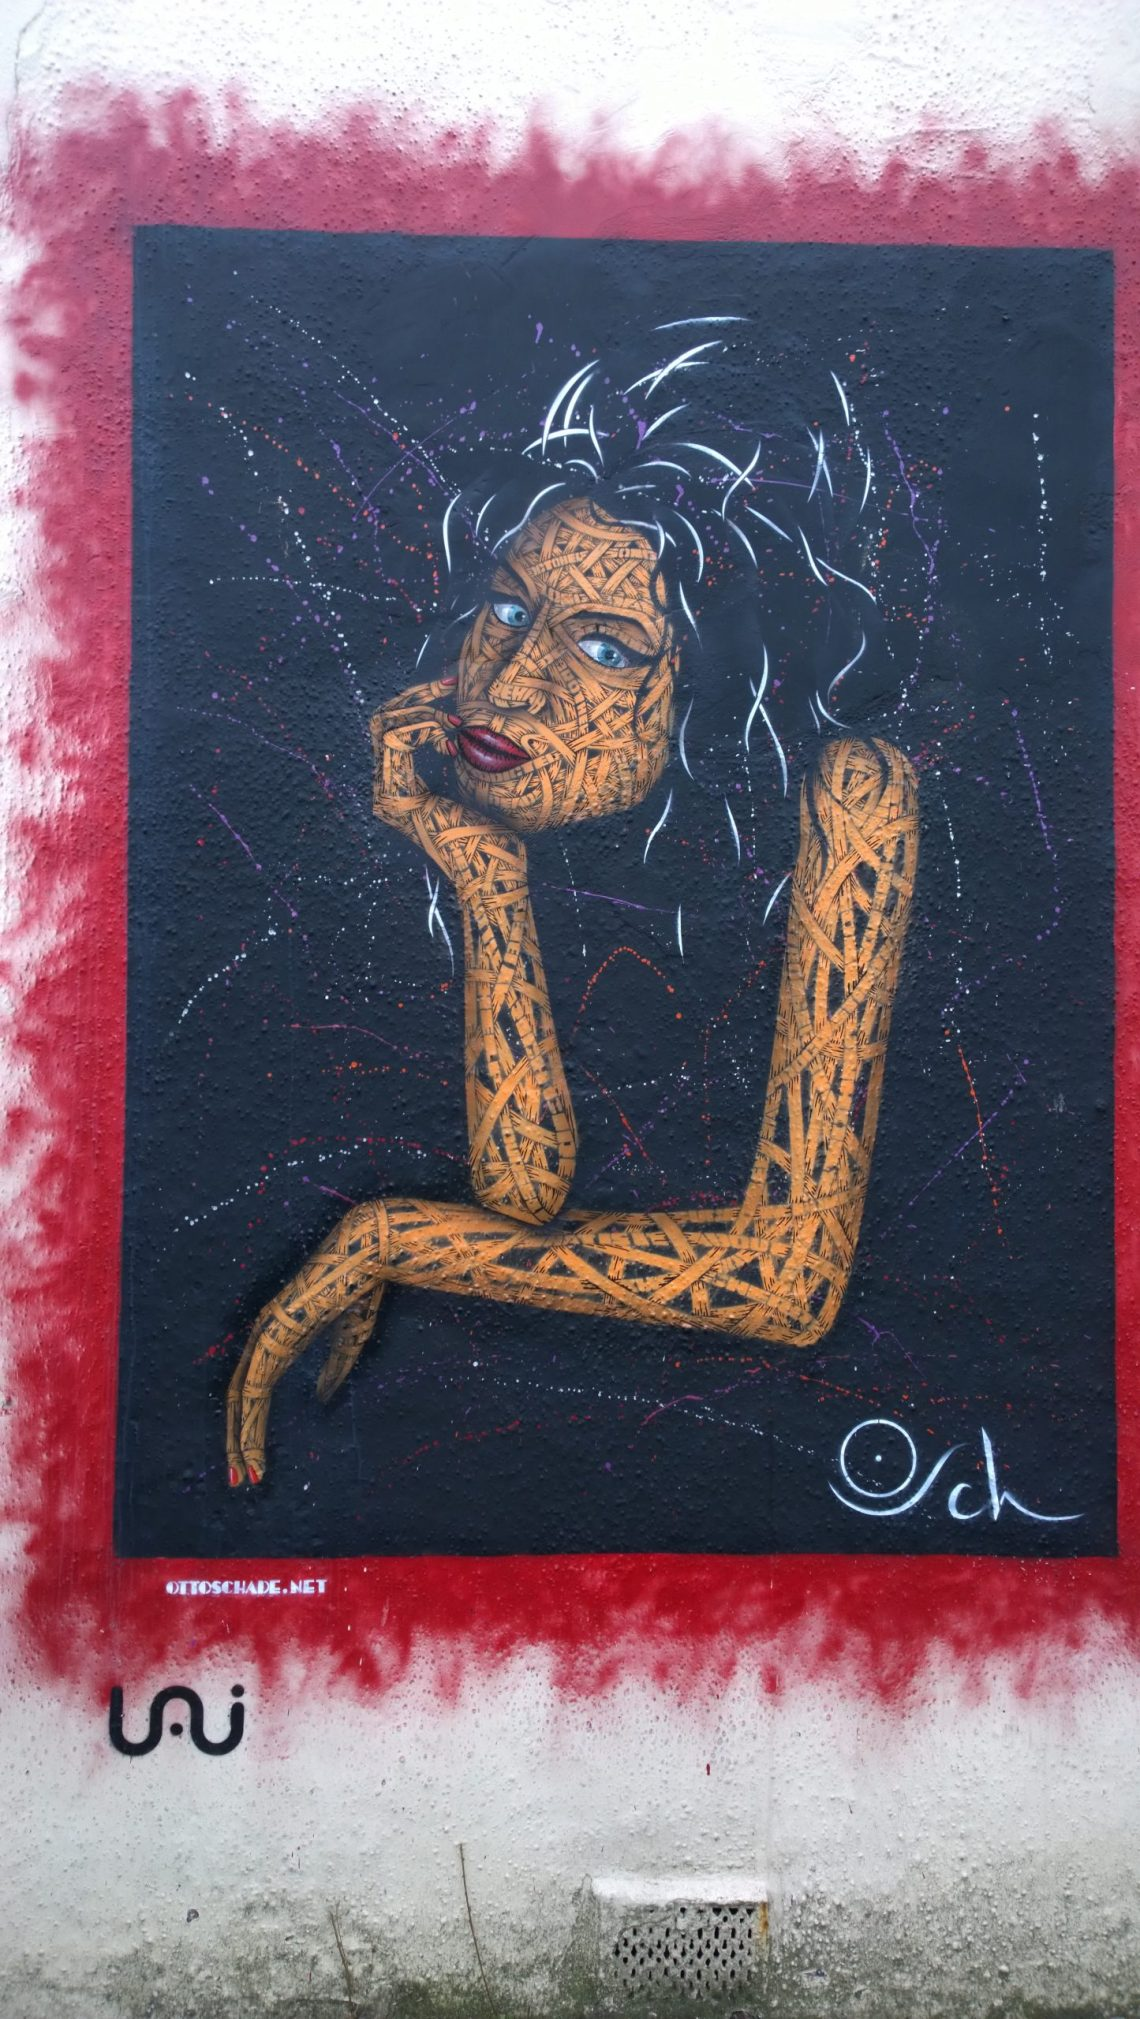 Amy Winehouse by Otto Schade